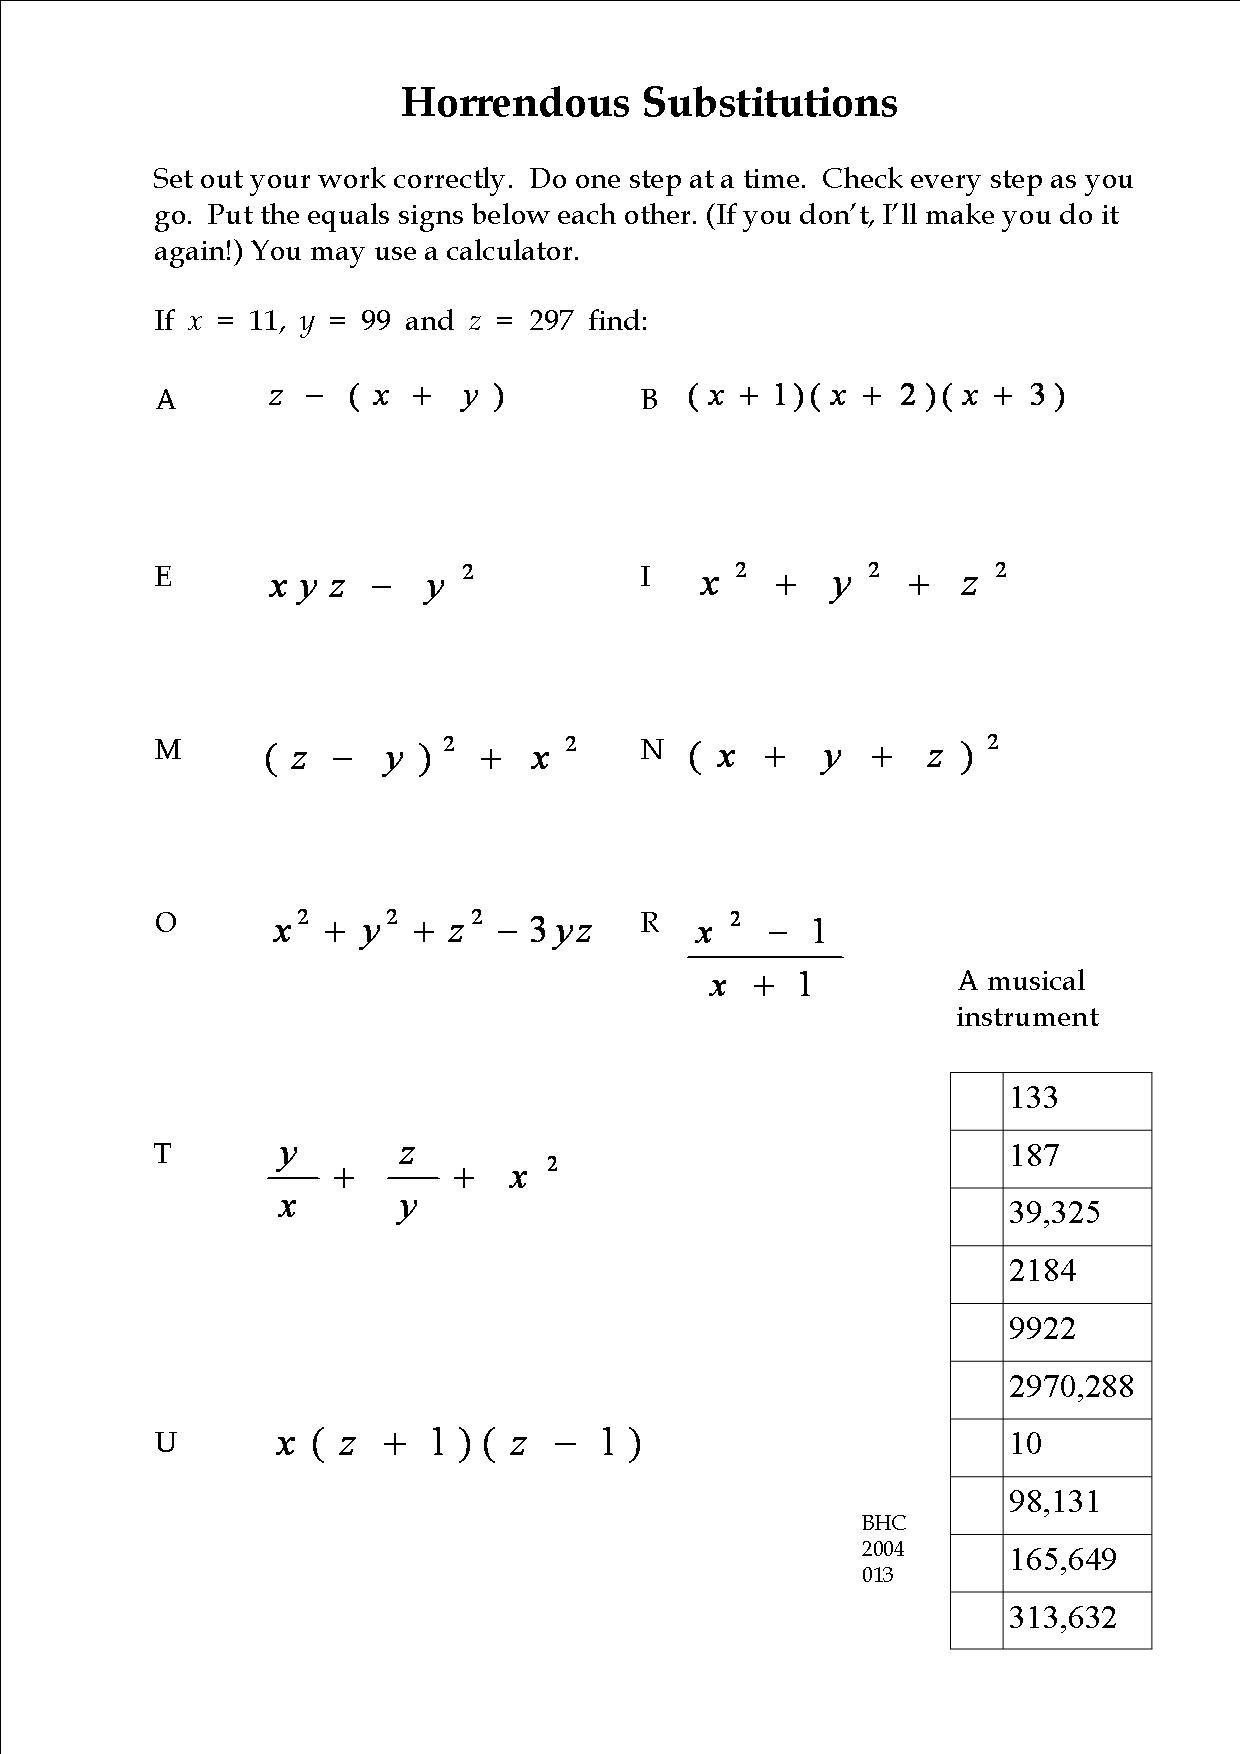 Funky Math Substitution Arbeitsblatt Ensign - Mathe Arbeitsblatt ...